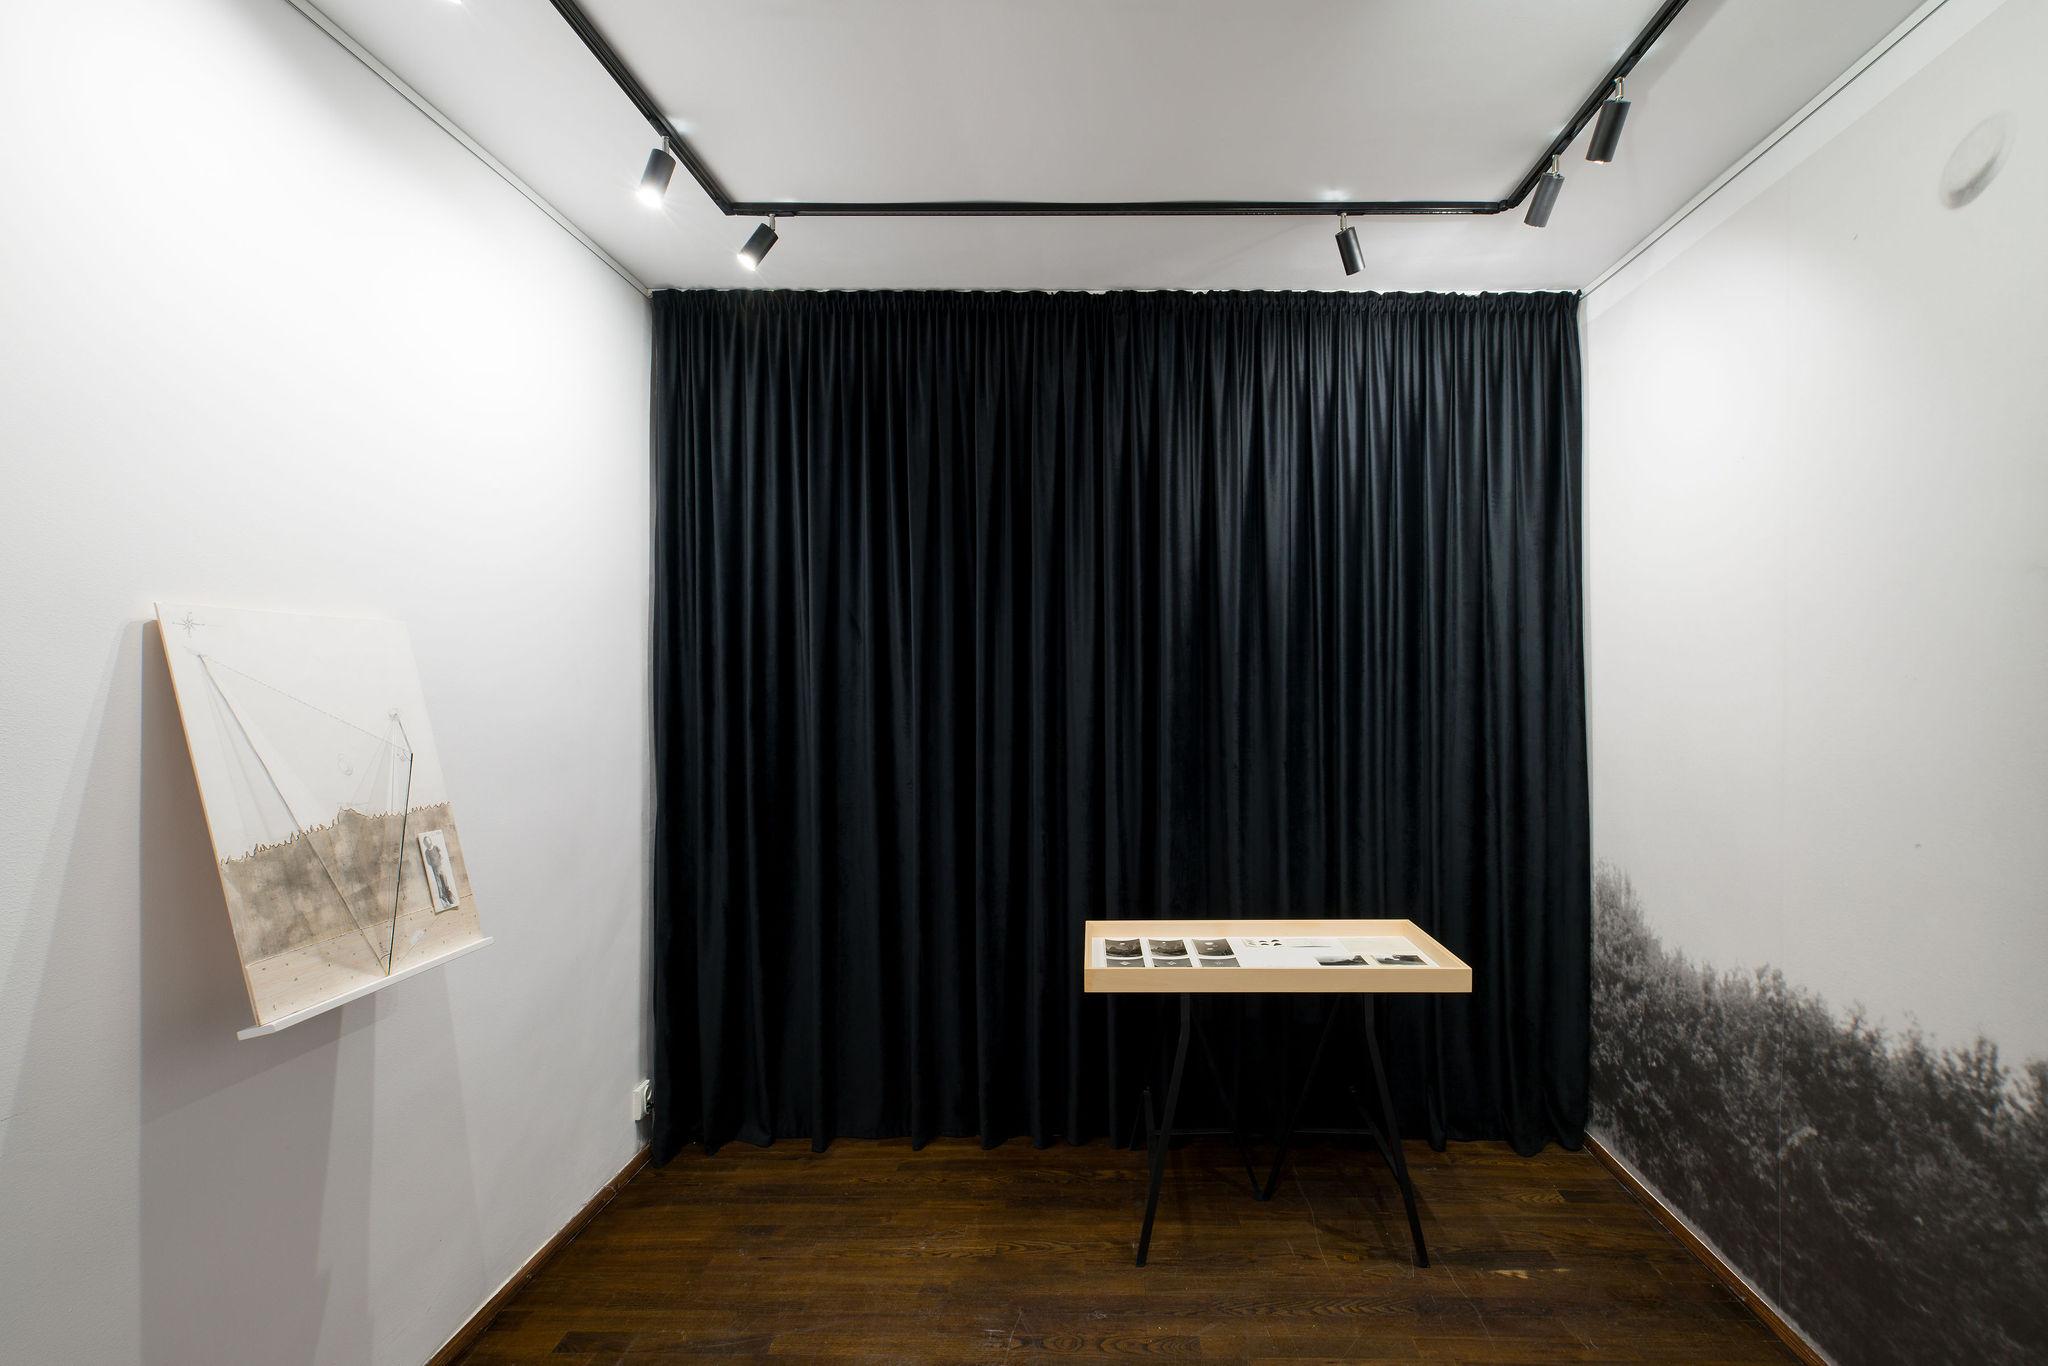 Arhiva Adrian Pătruț, Installation View, Zina Gallery, 2021